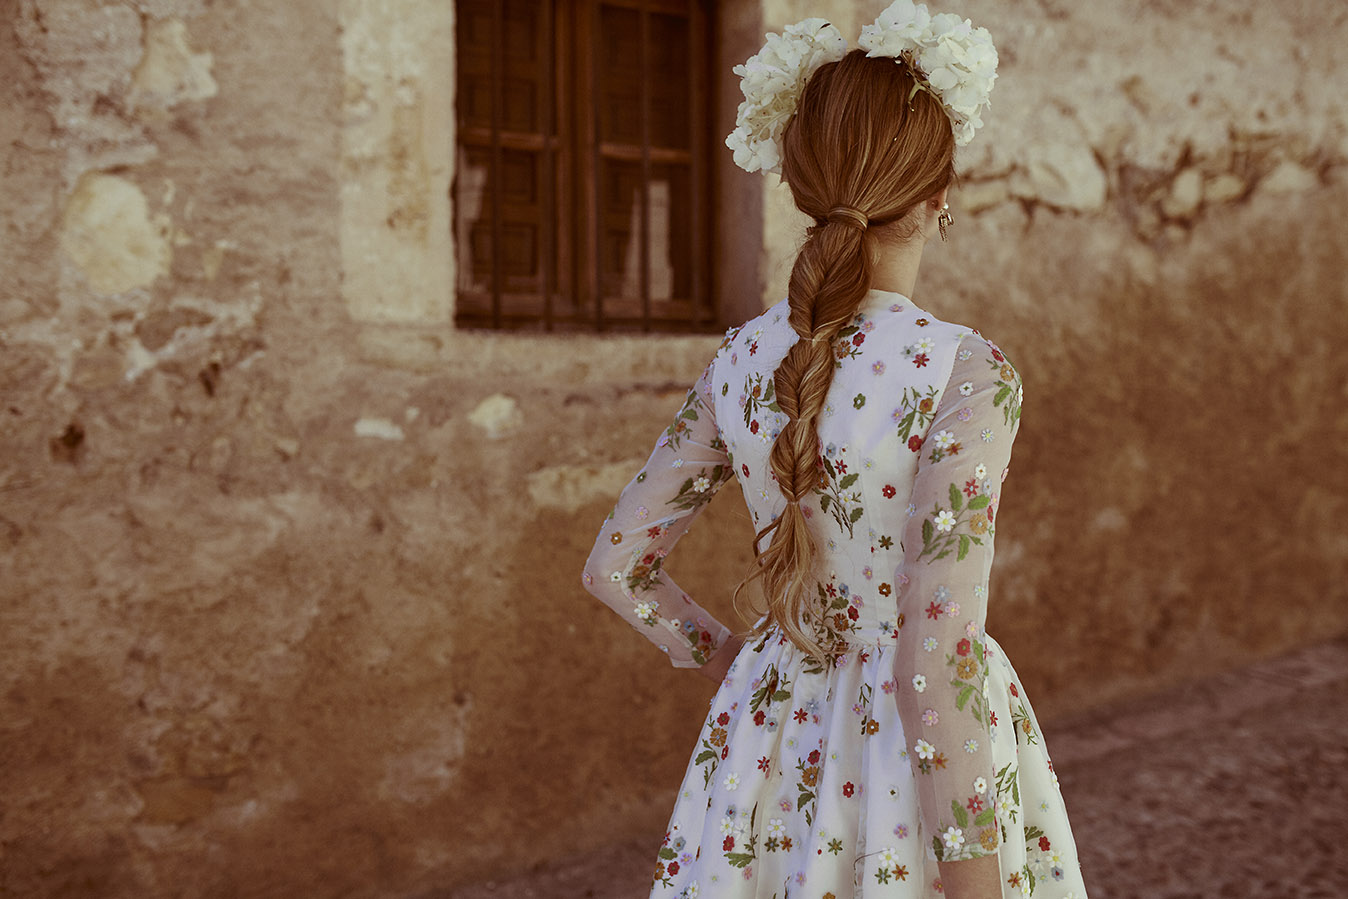 Invitadas con estilo vestido flores kolonaki 8